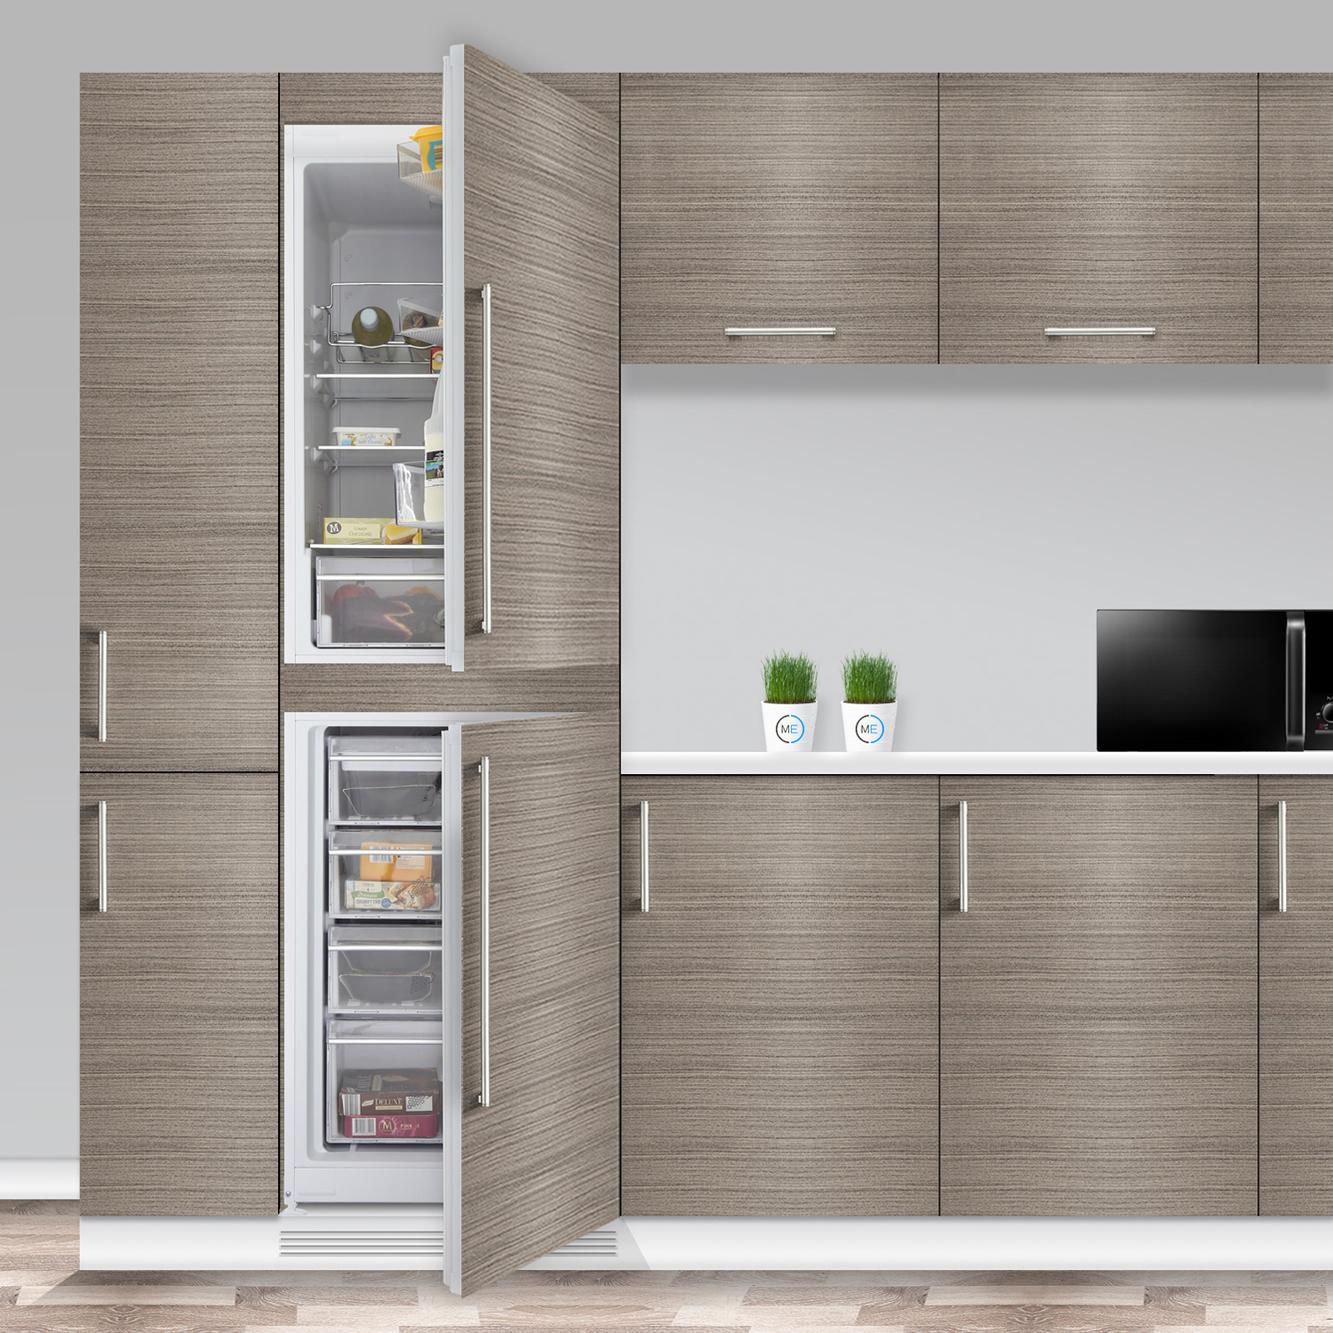 Buy blomberg knm4561i frost free integrated fridge freezer - Integrated freezer ...